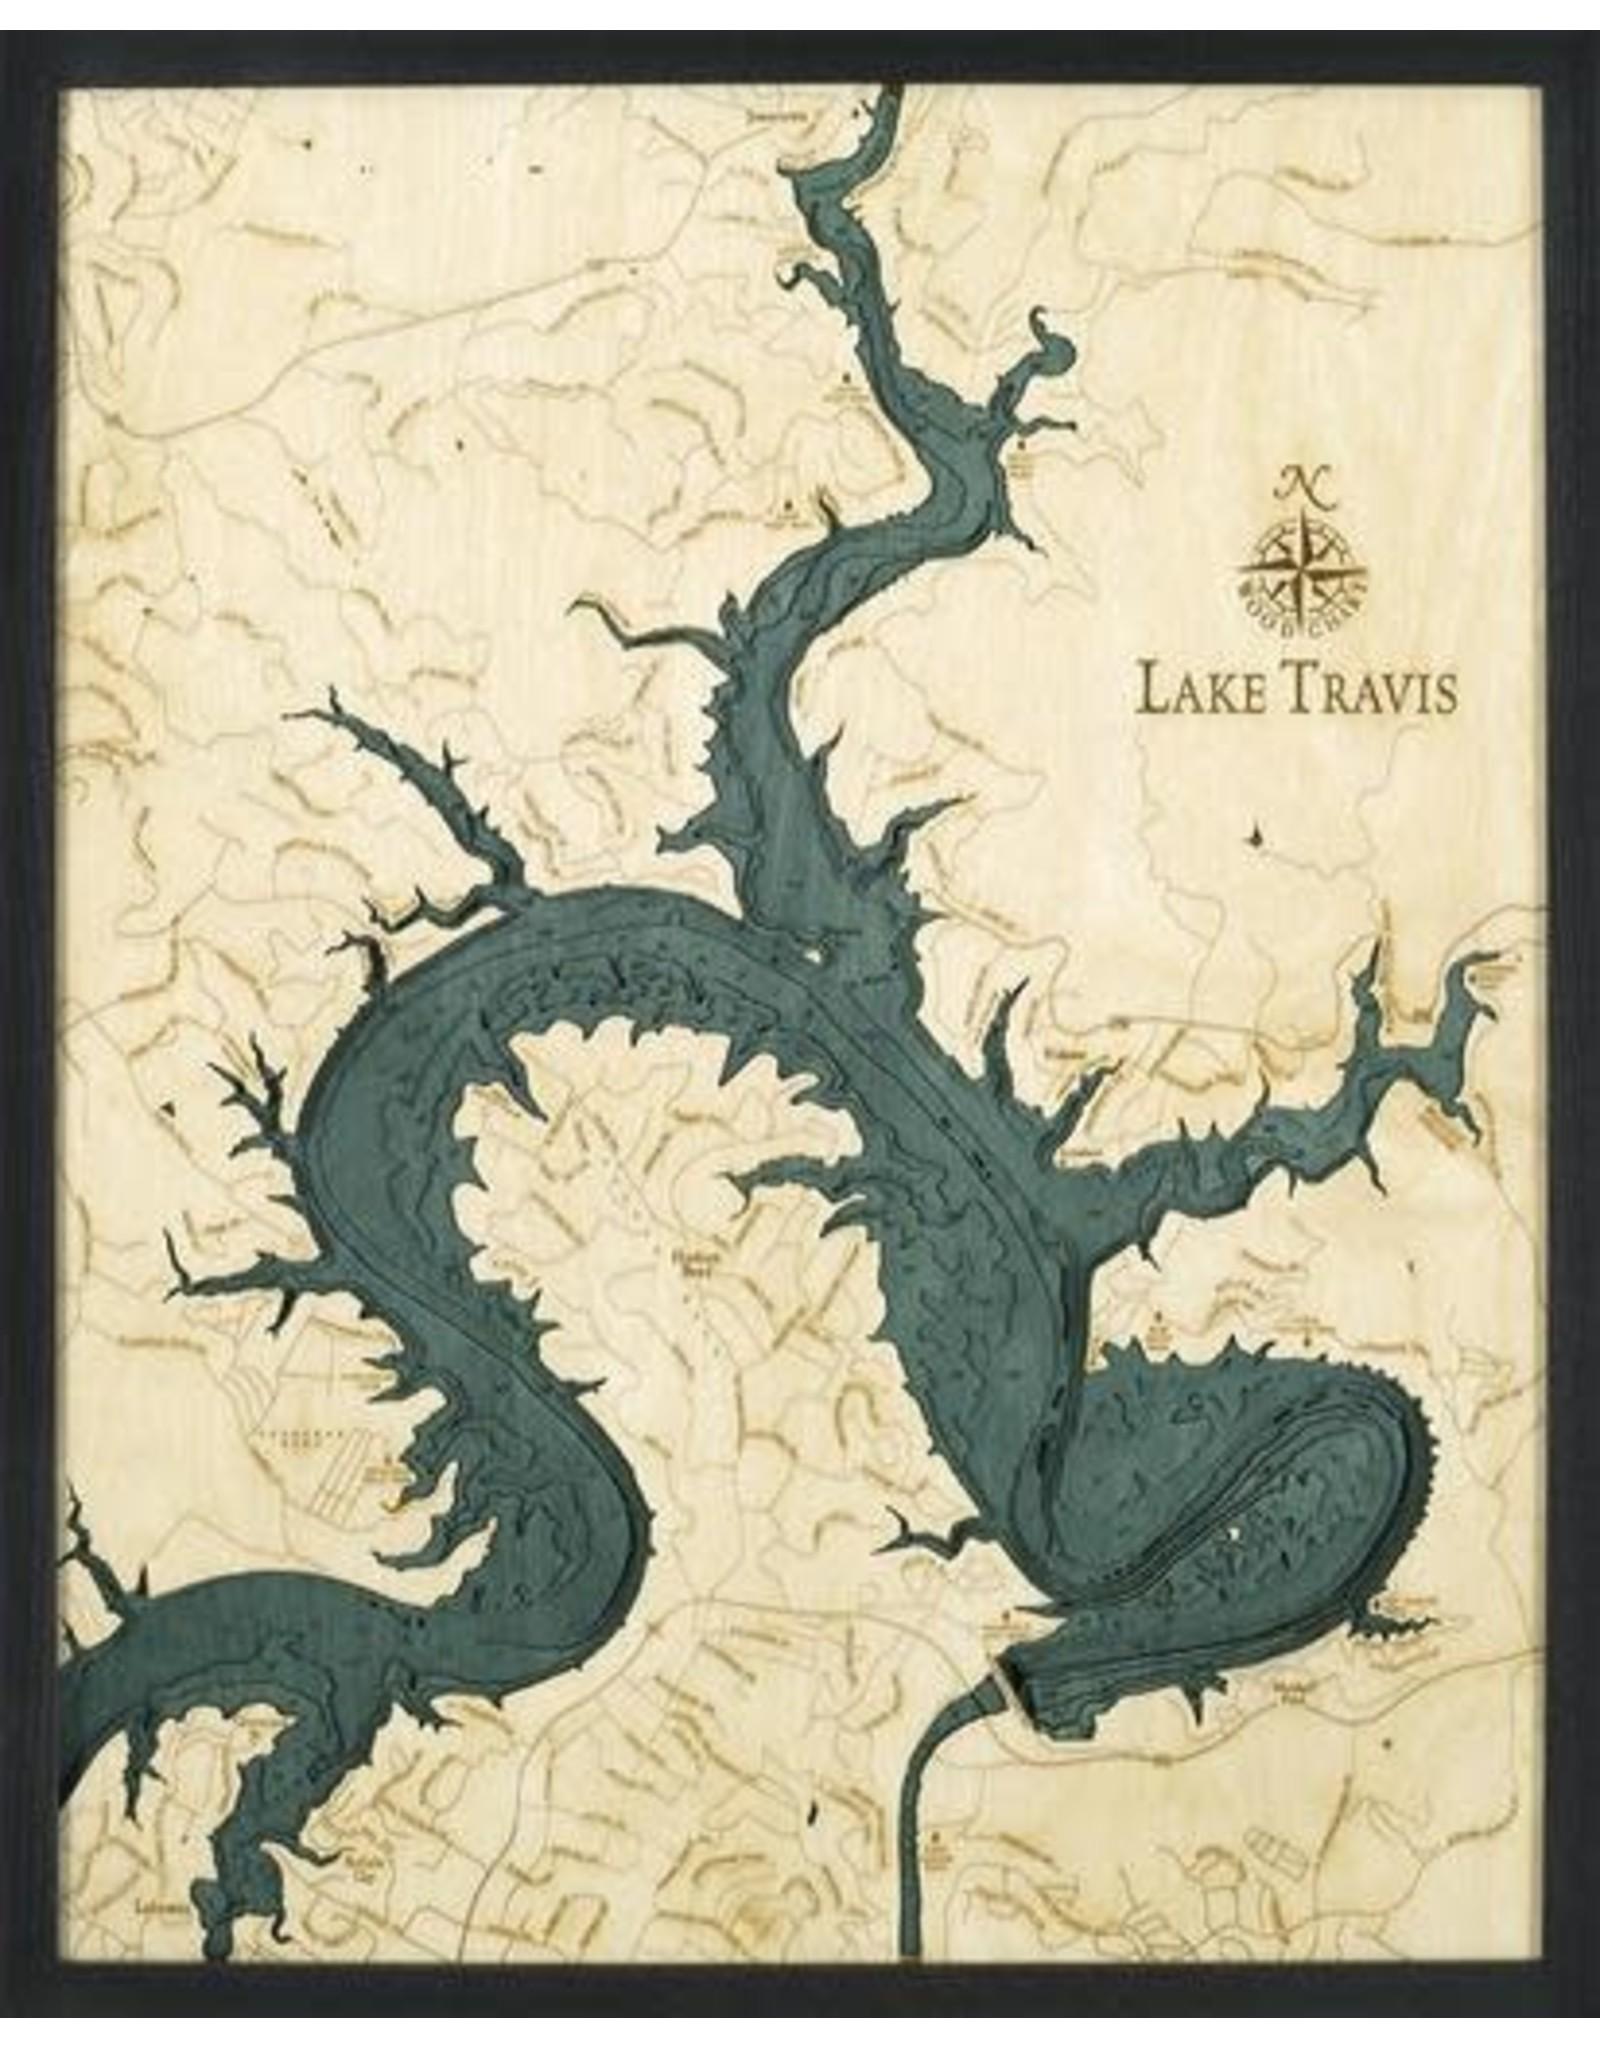 WoodCharts Lake Travis, TX (Bathymetric 3-D Wood Carved Nautical Chart)